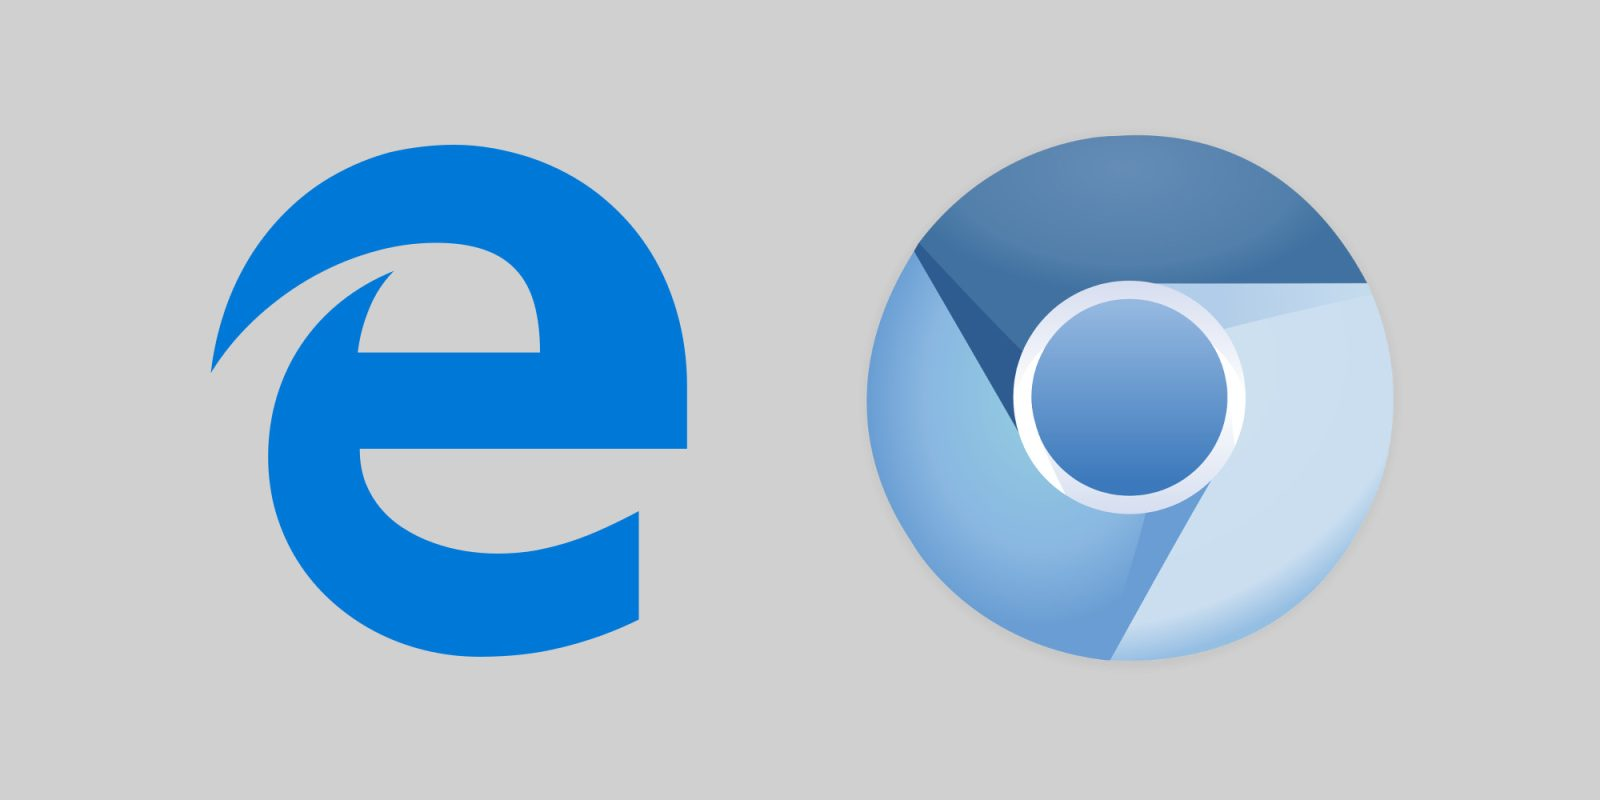 Edge开发团队透露更多细节:兼容Chrome扩展的照片